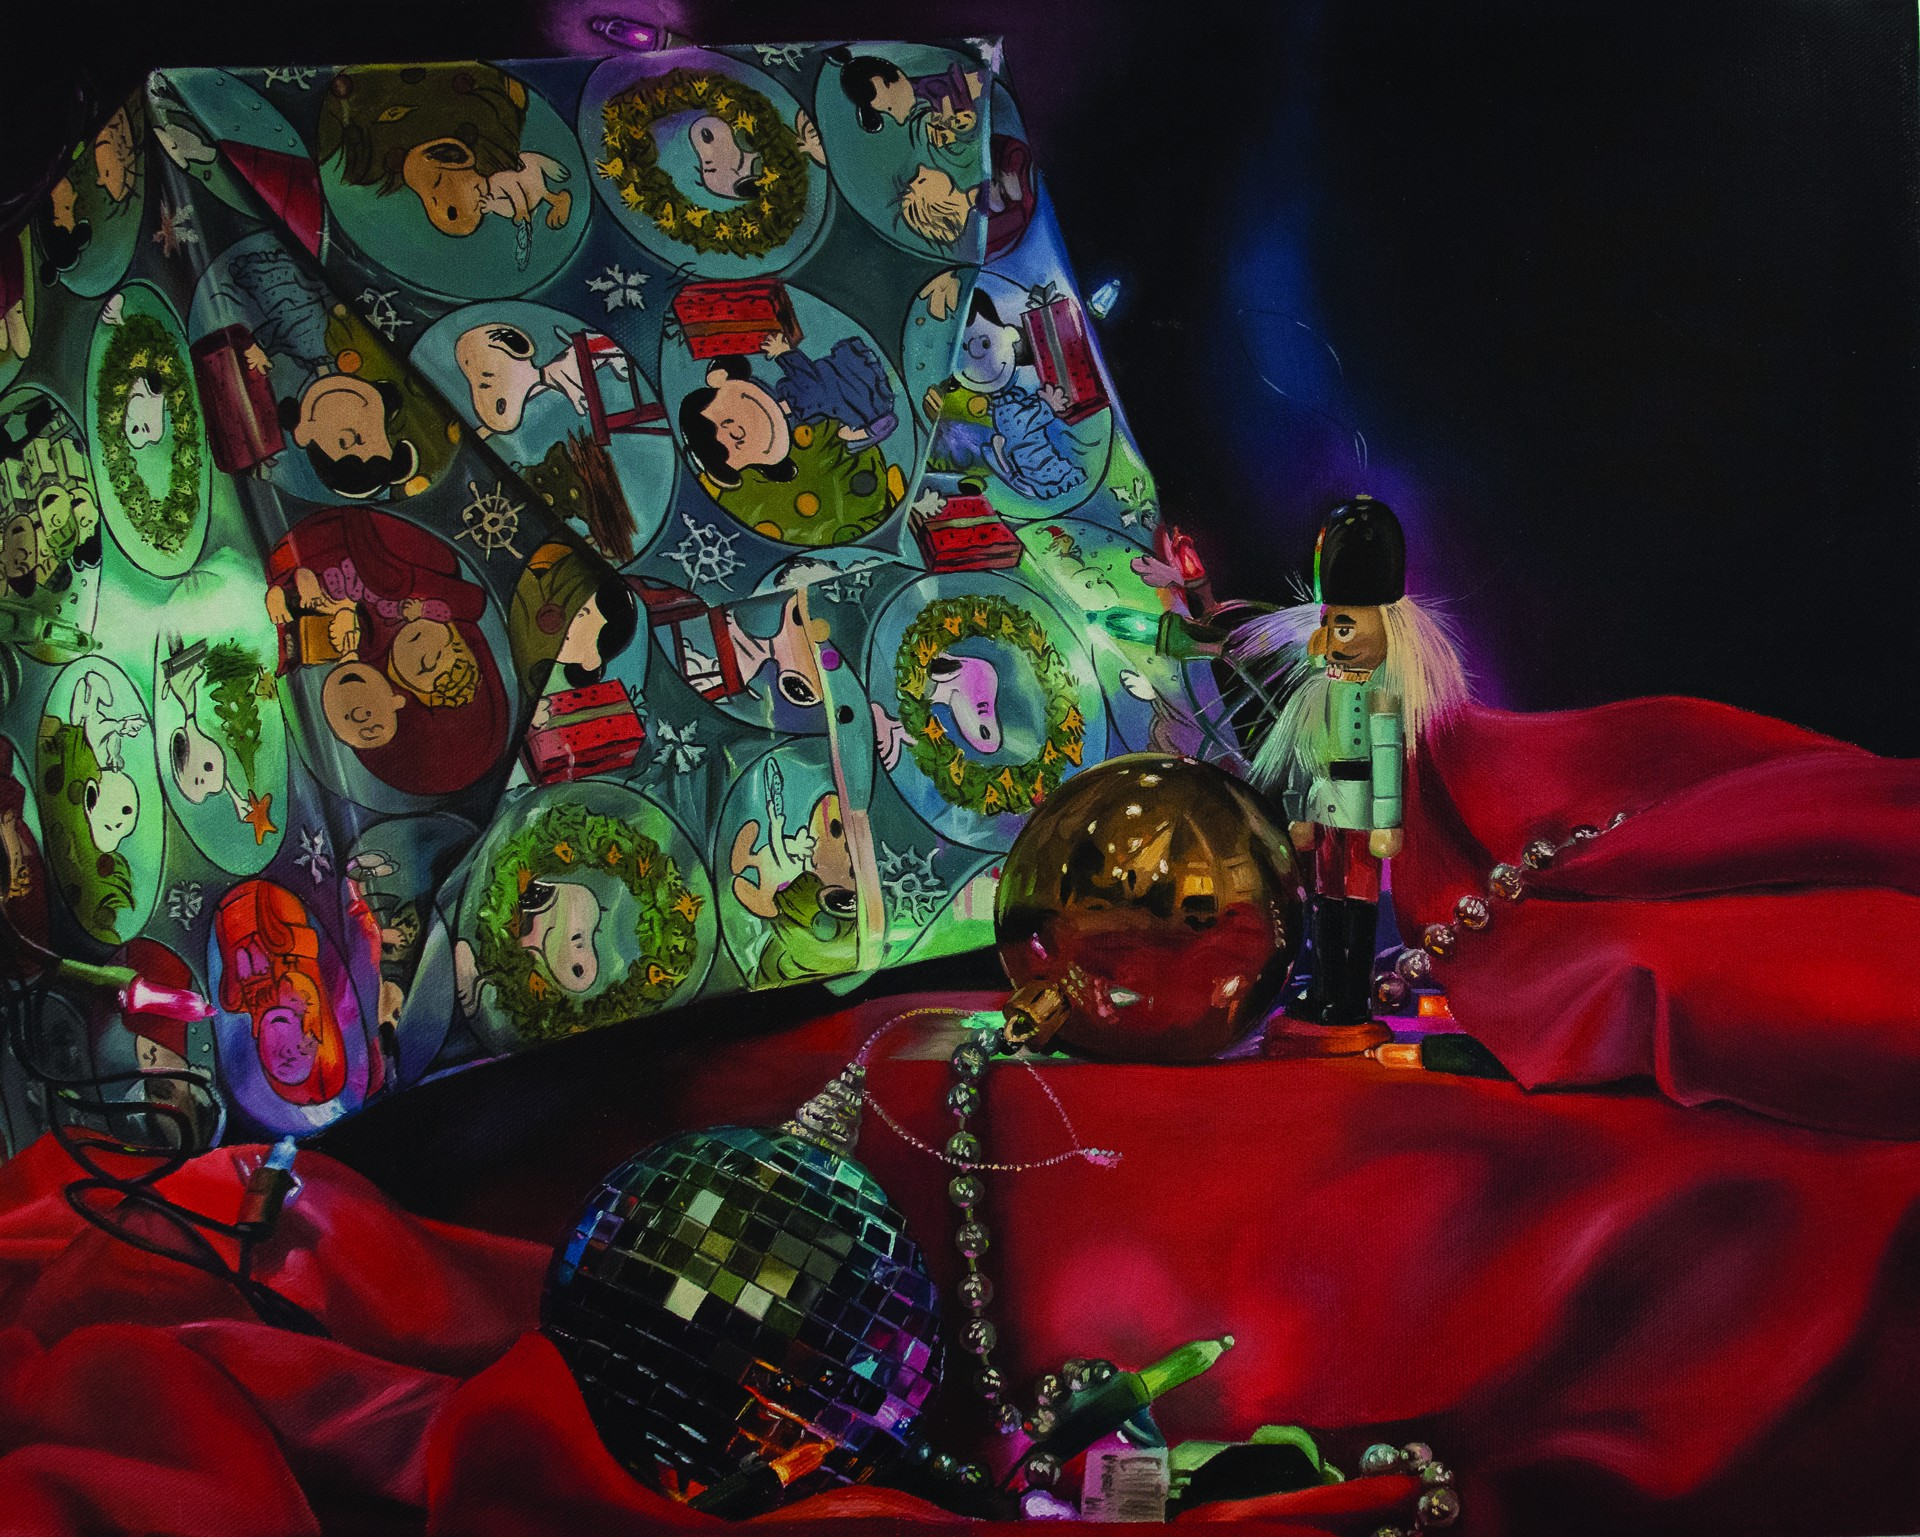 Reflections of Christmas by Daniela Velez